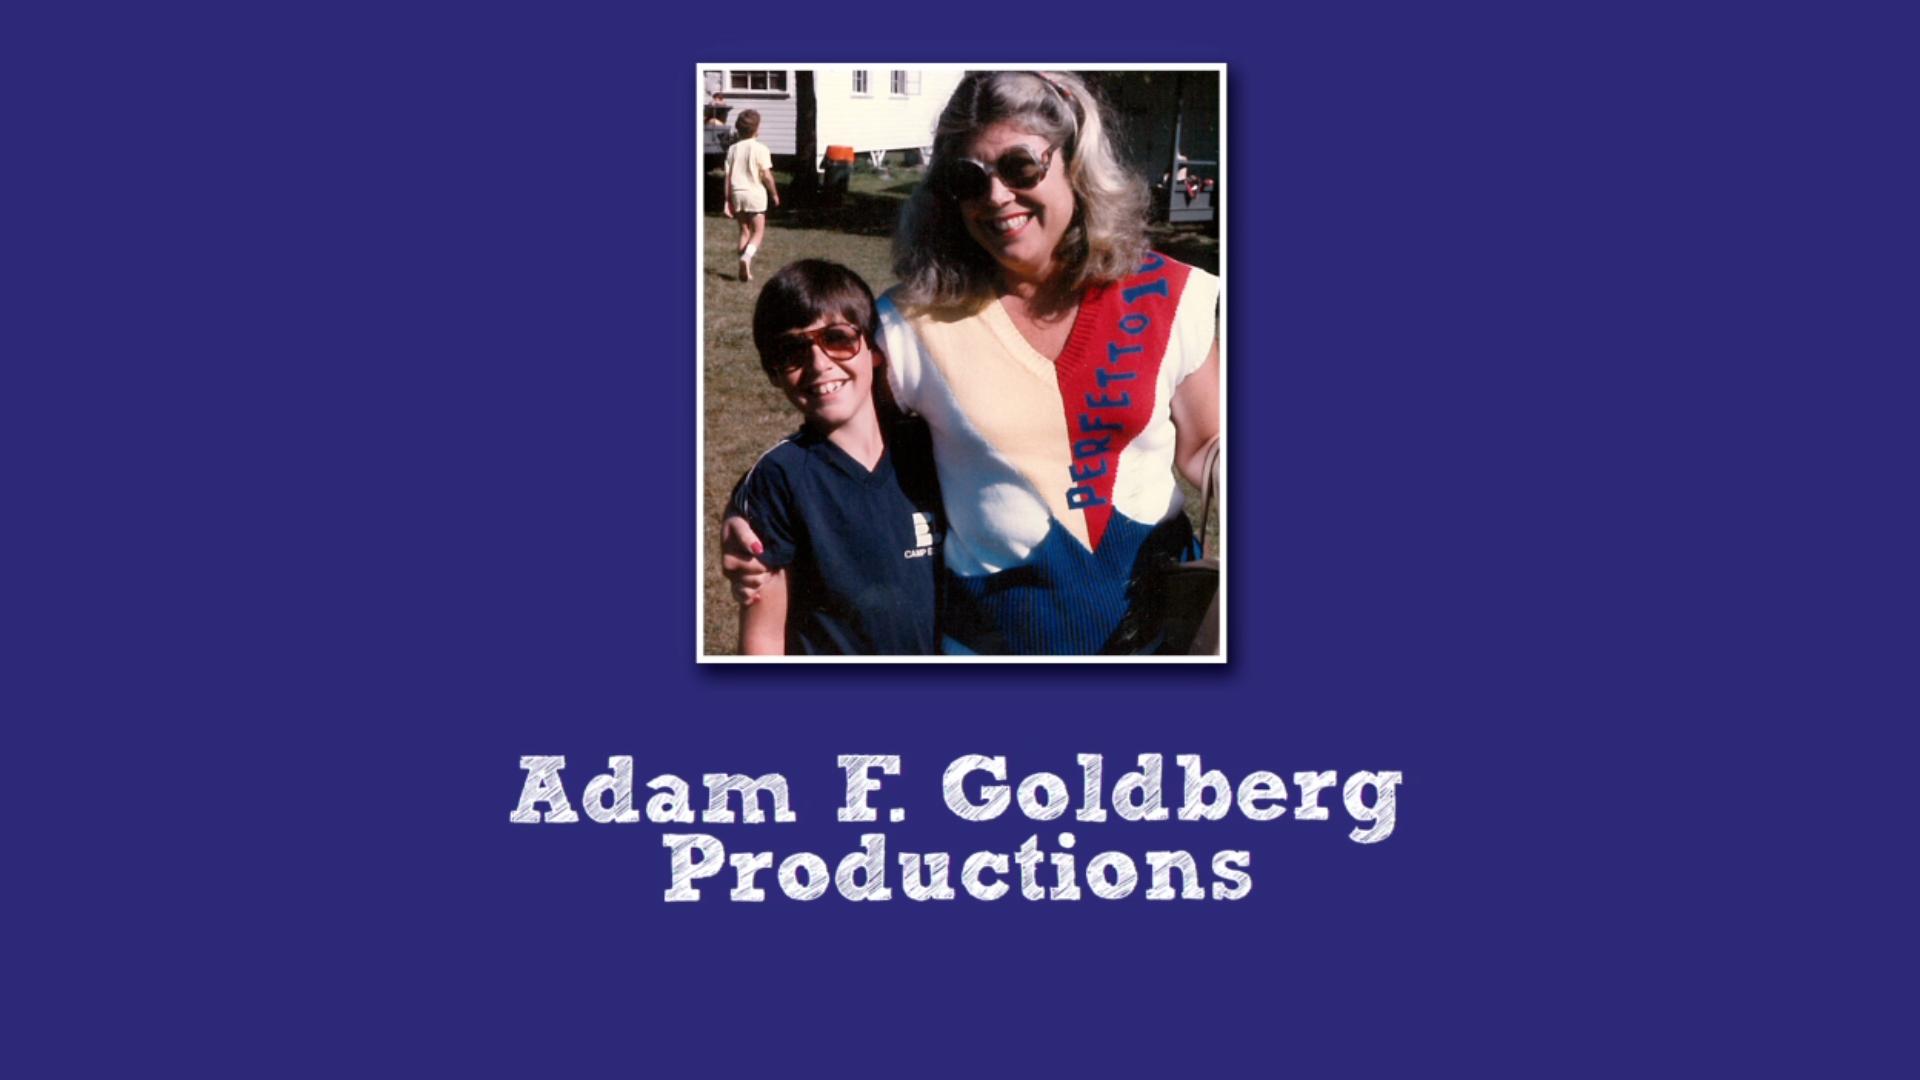 Adam goldberg sister